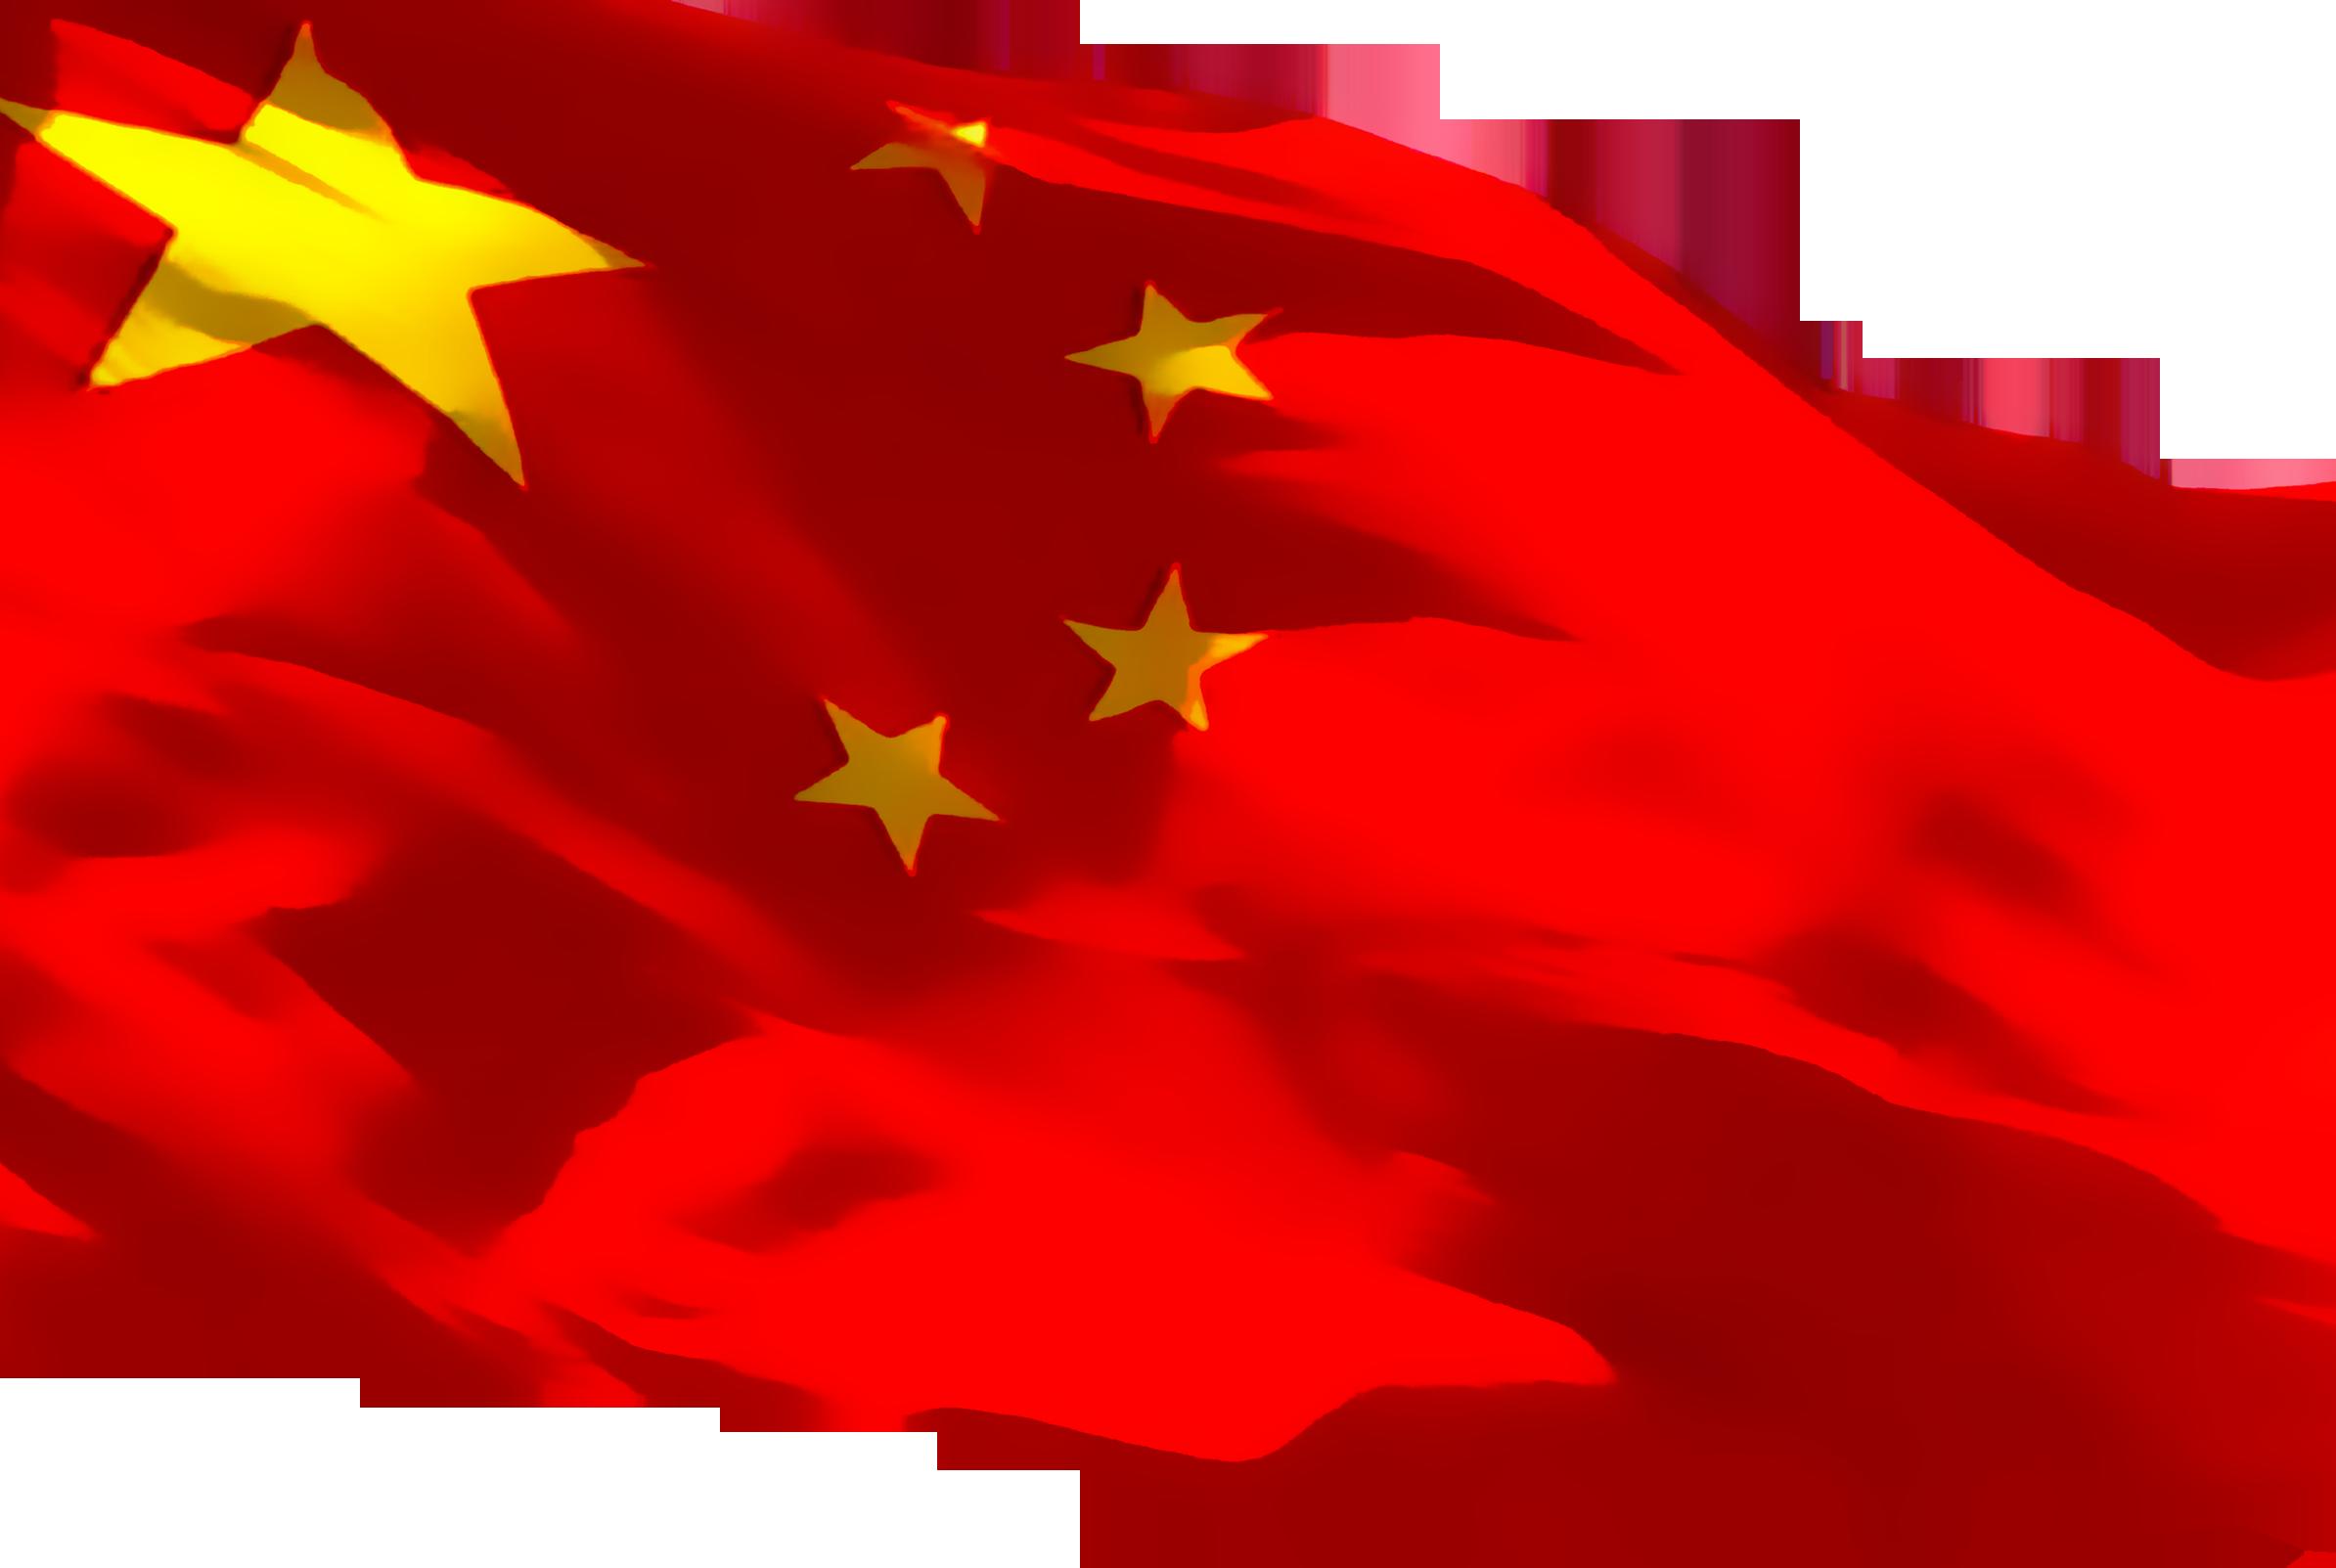 China Flag Download.